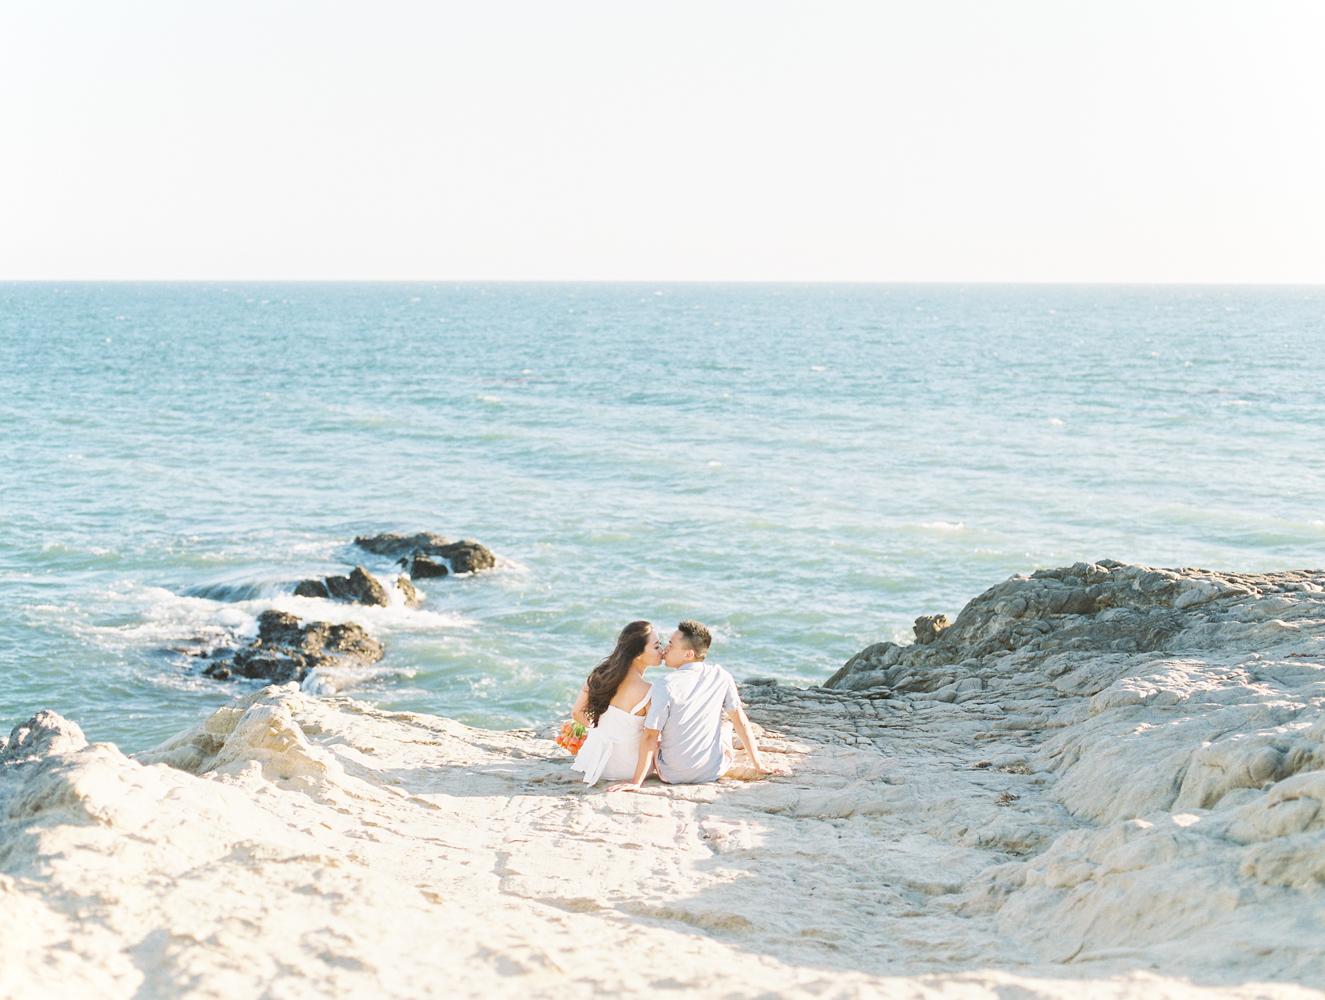 Leo_Carillo_Beach_Malibu_Engagement_Session_Anya_Kernes-2.jpg